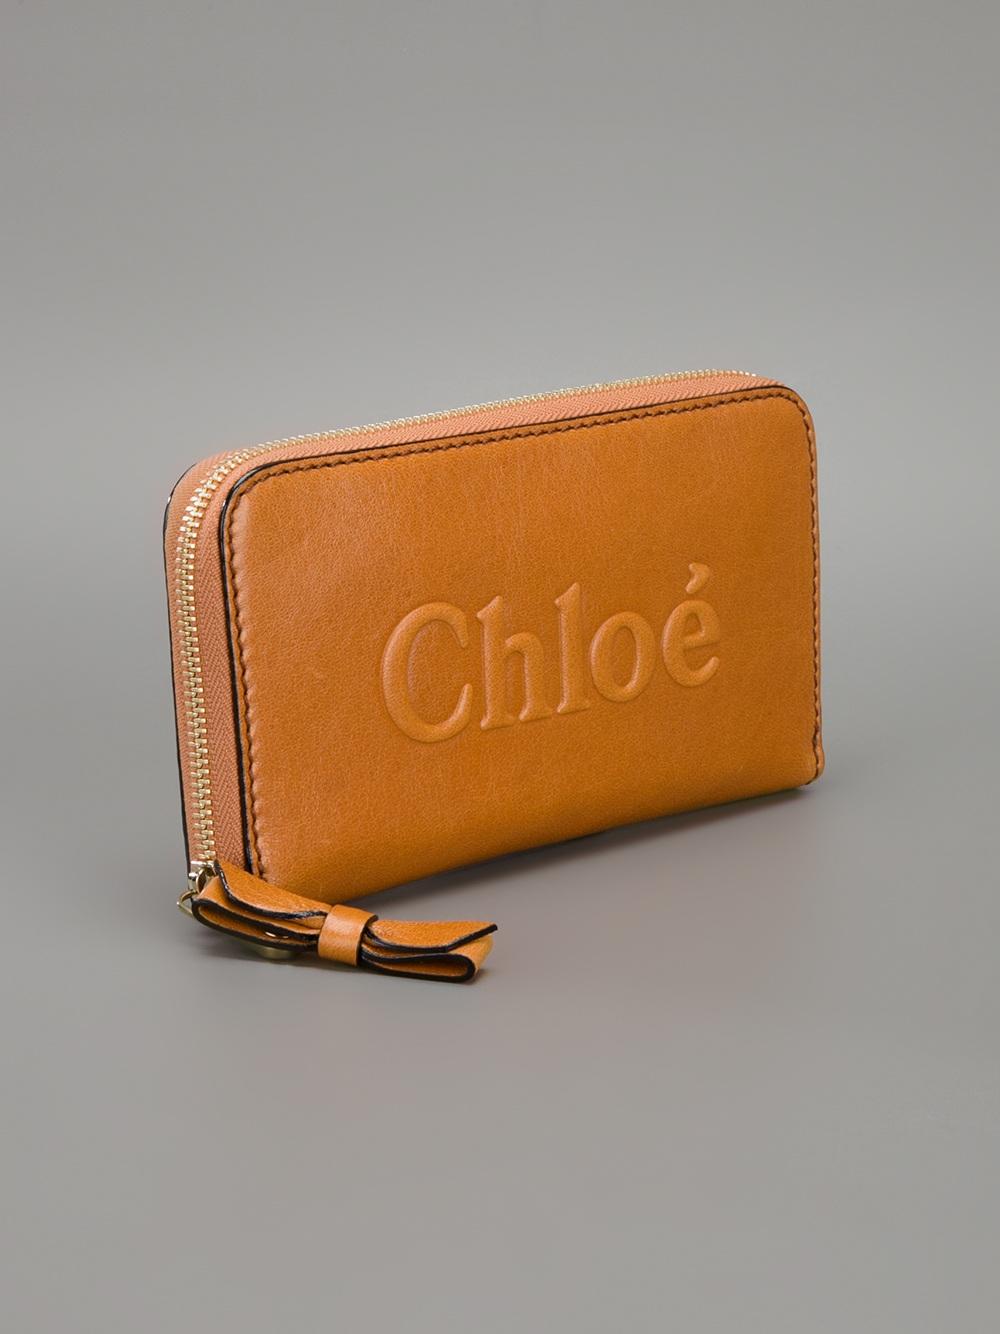 Lyst Chlo 233 Brand Embossed Purse In Brown